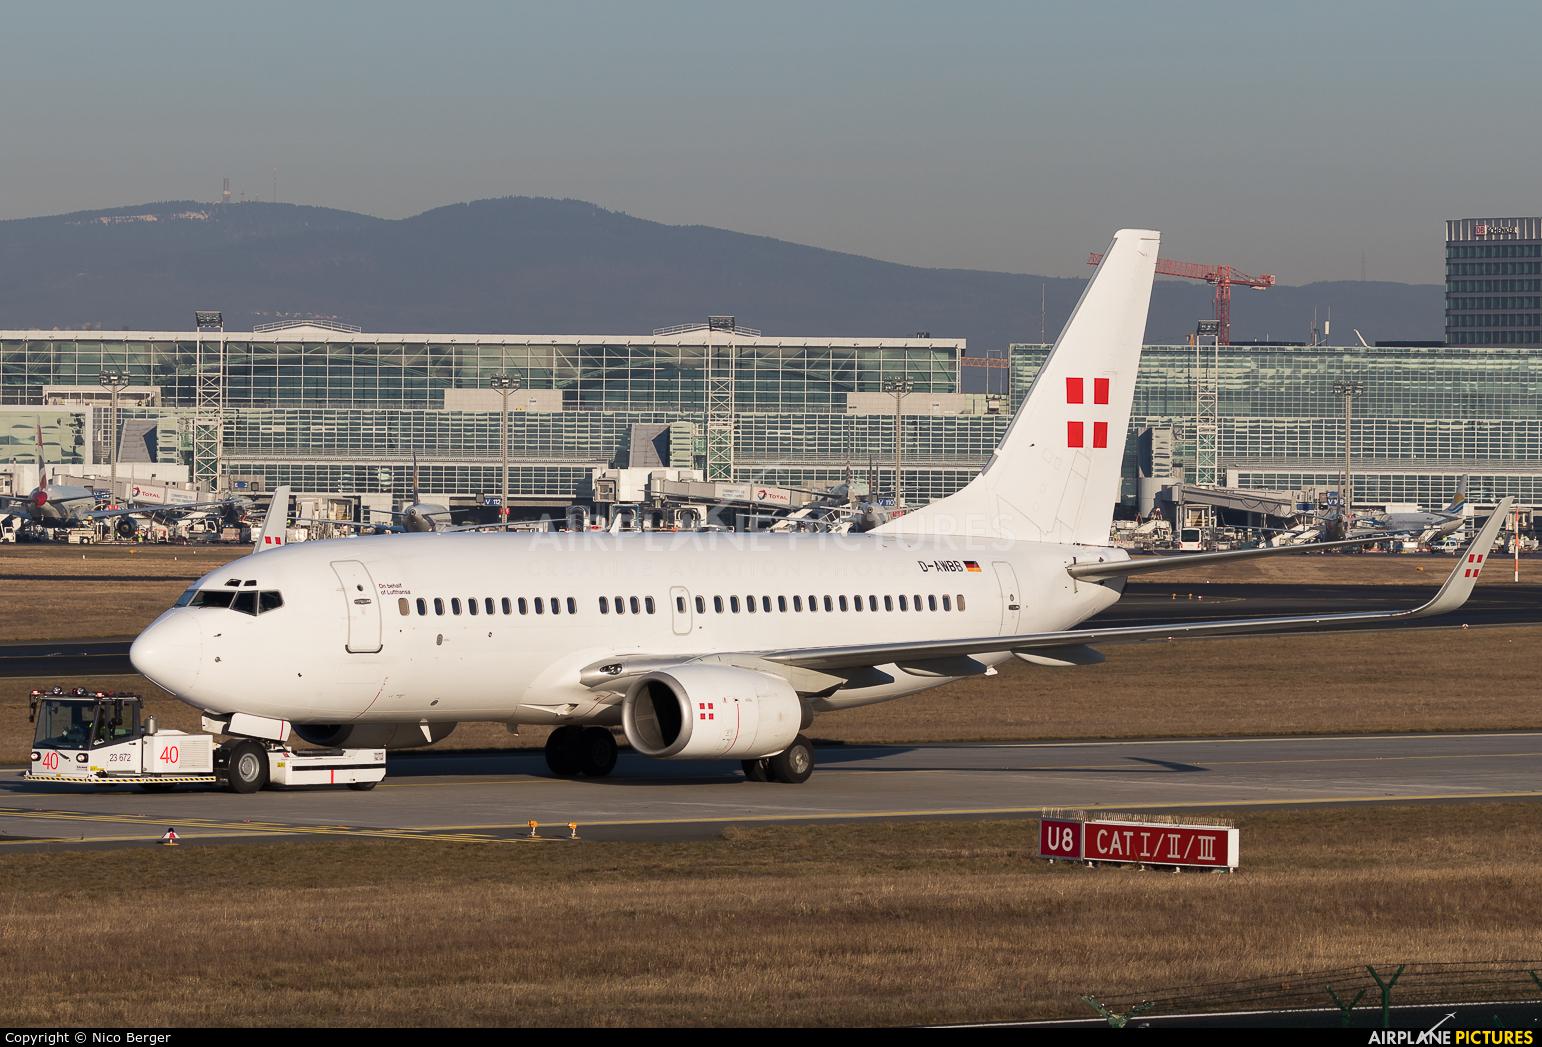 PrivatAir D-AWBB aircraft at Frankfurt